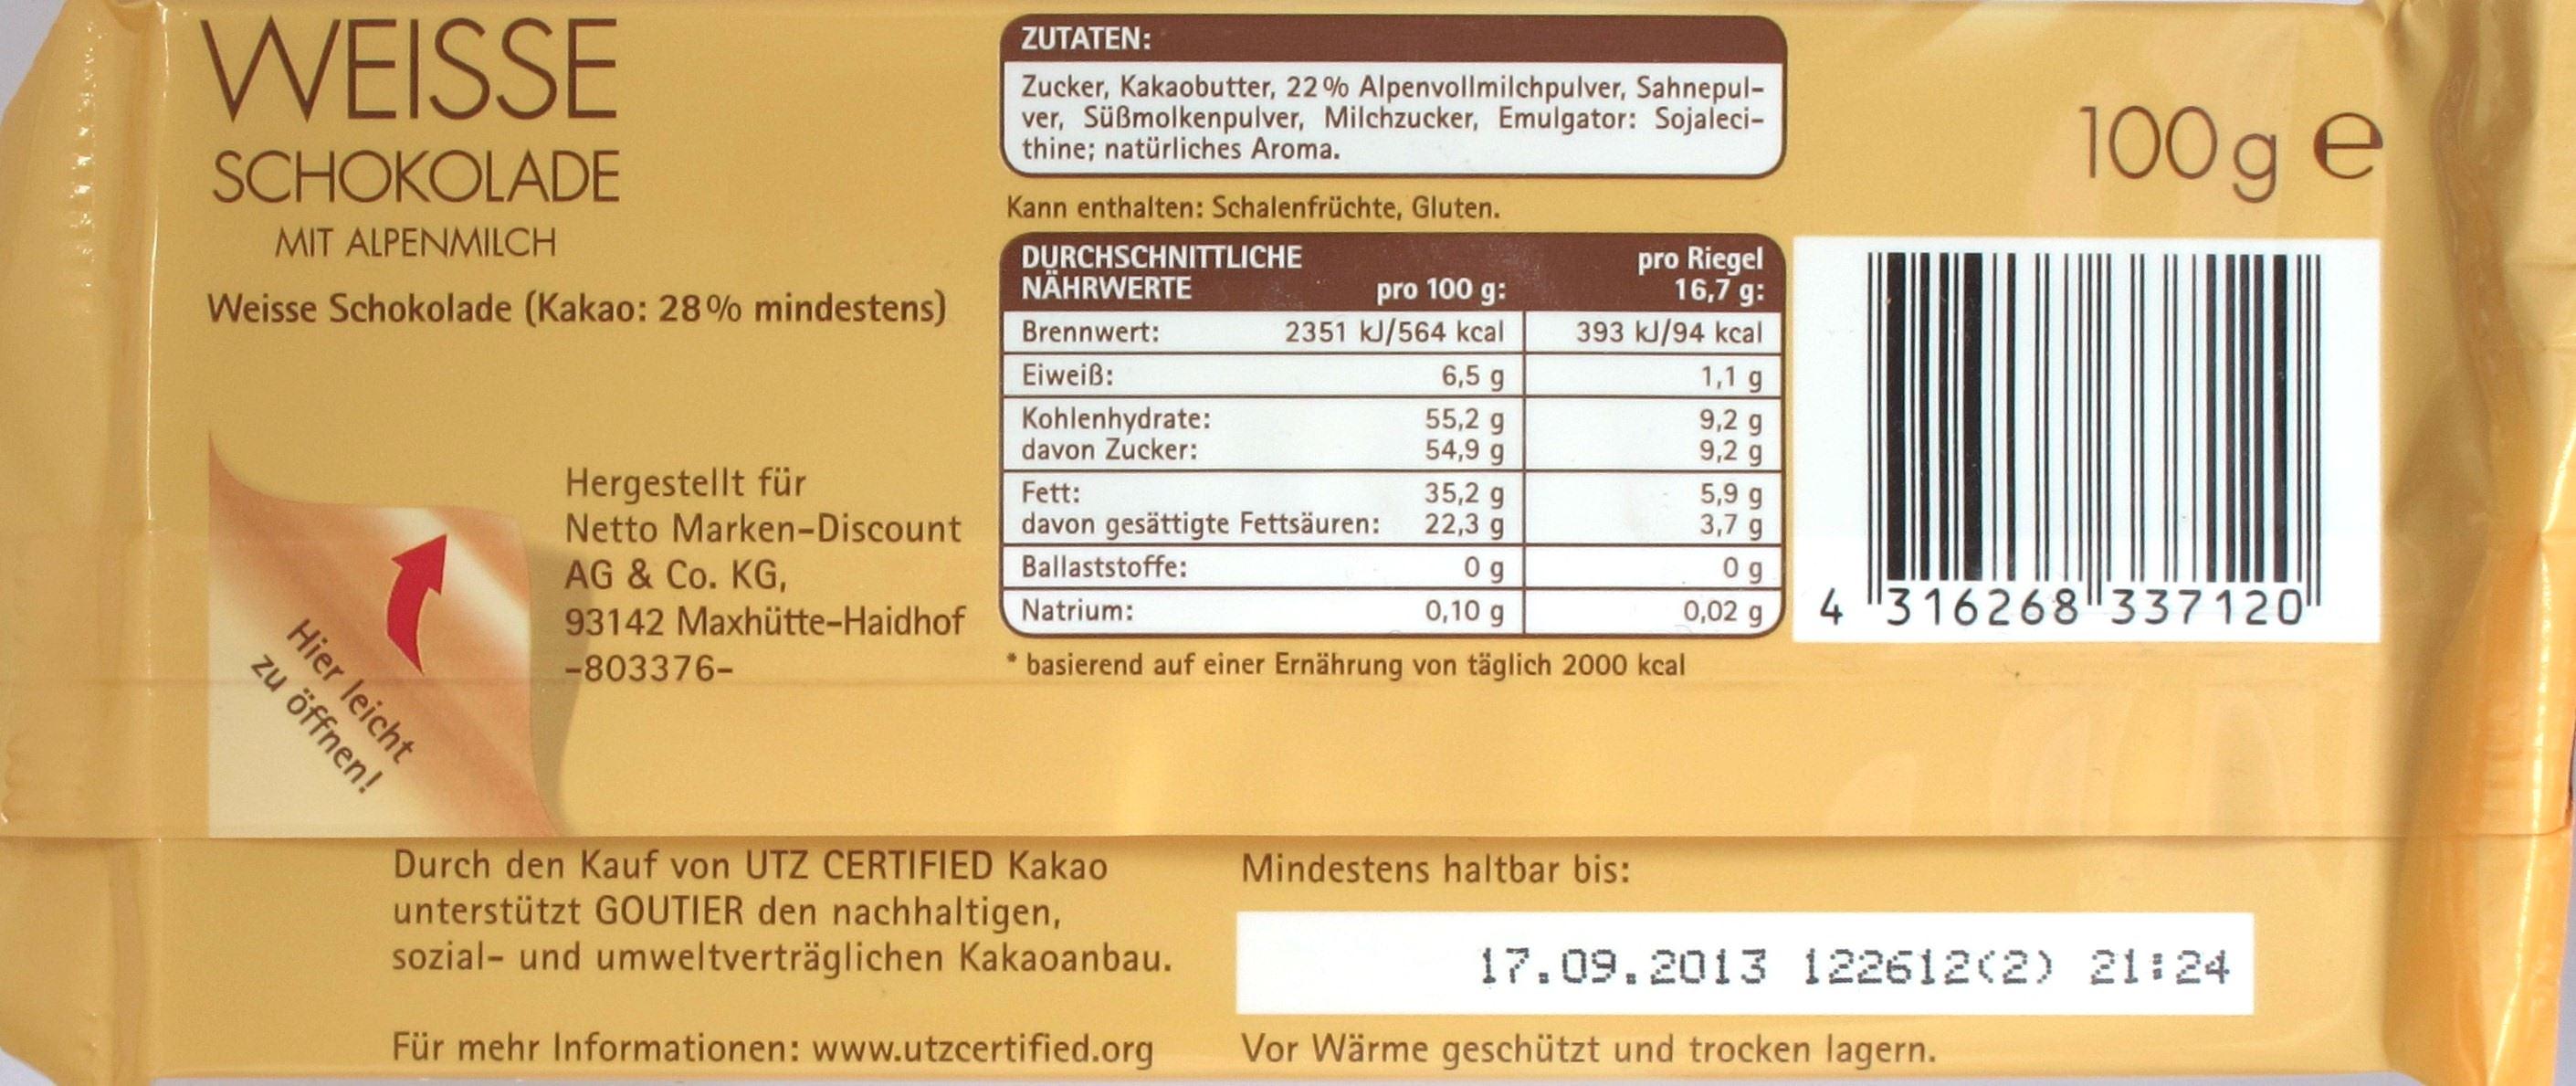 Goutier/Netto Weiße Schokolade: Rückseite